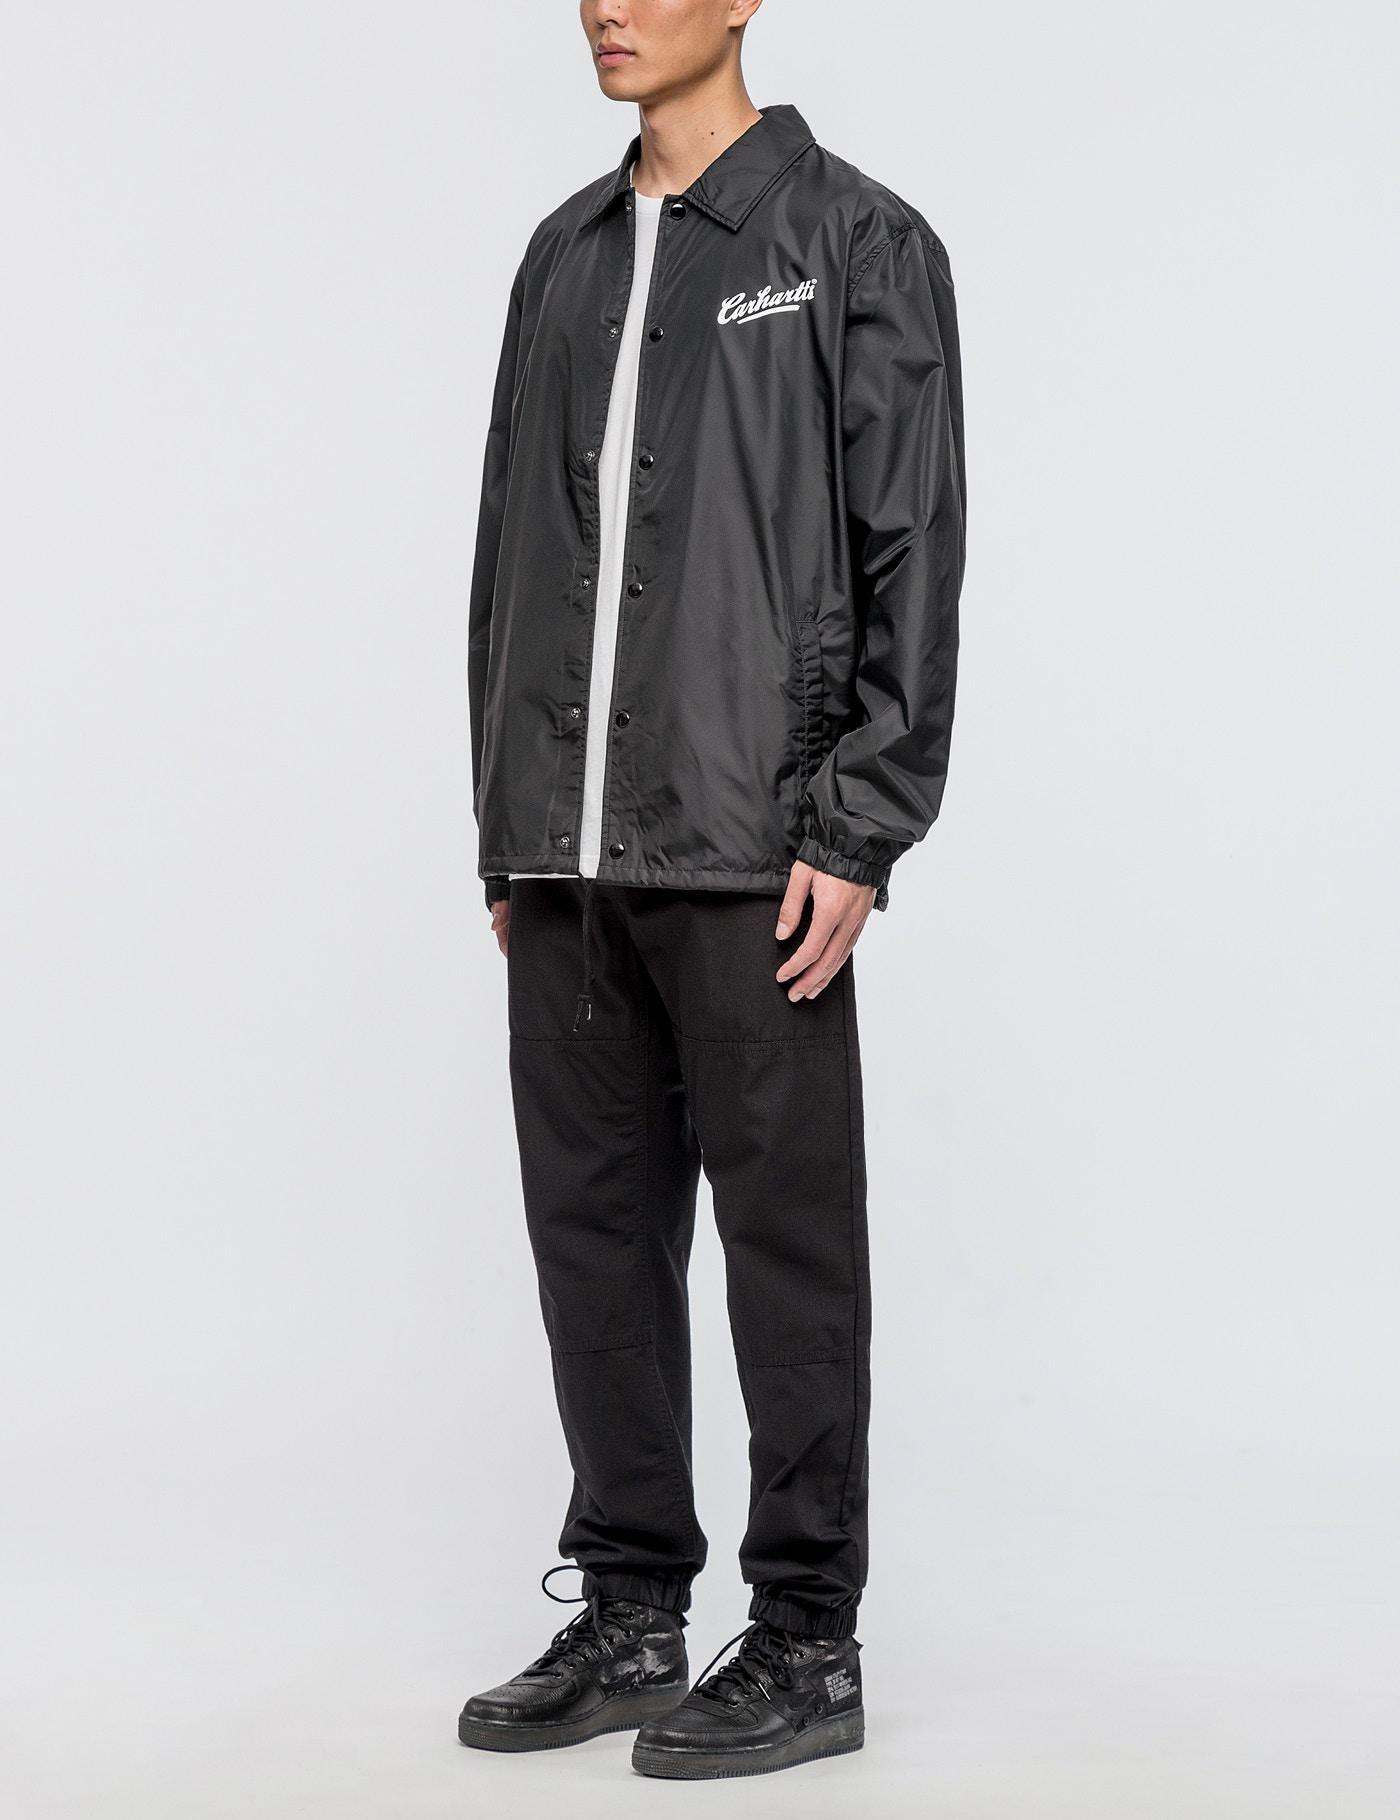 lyst carhartt wip carhartts coach jacket in black for men. Black Bedroom Furniture Sets. Home Design Ideas